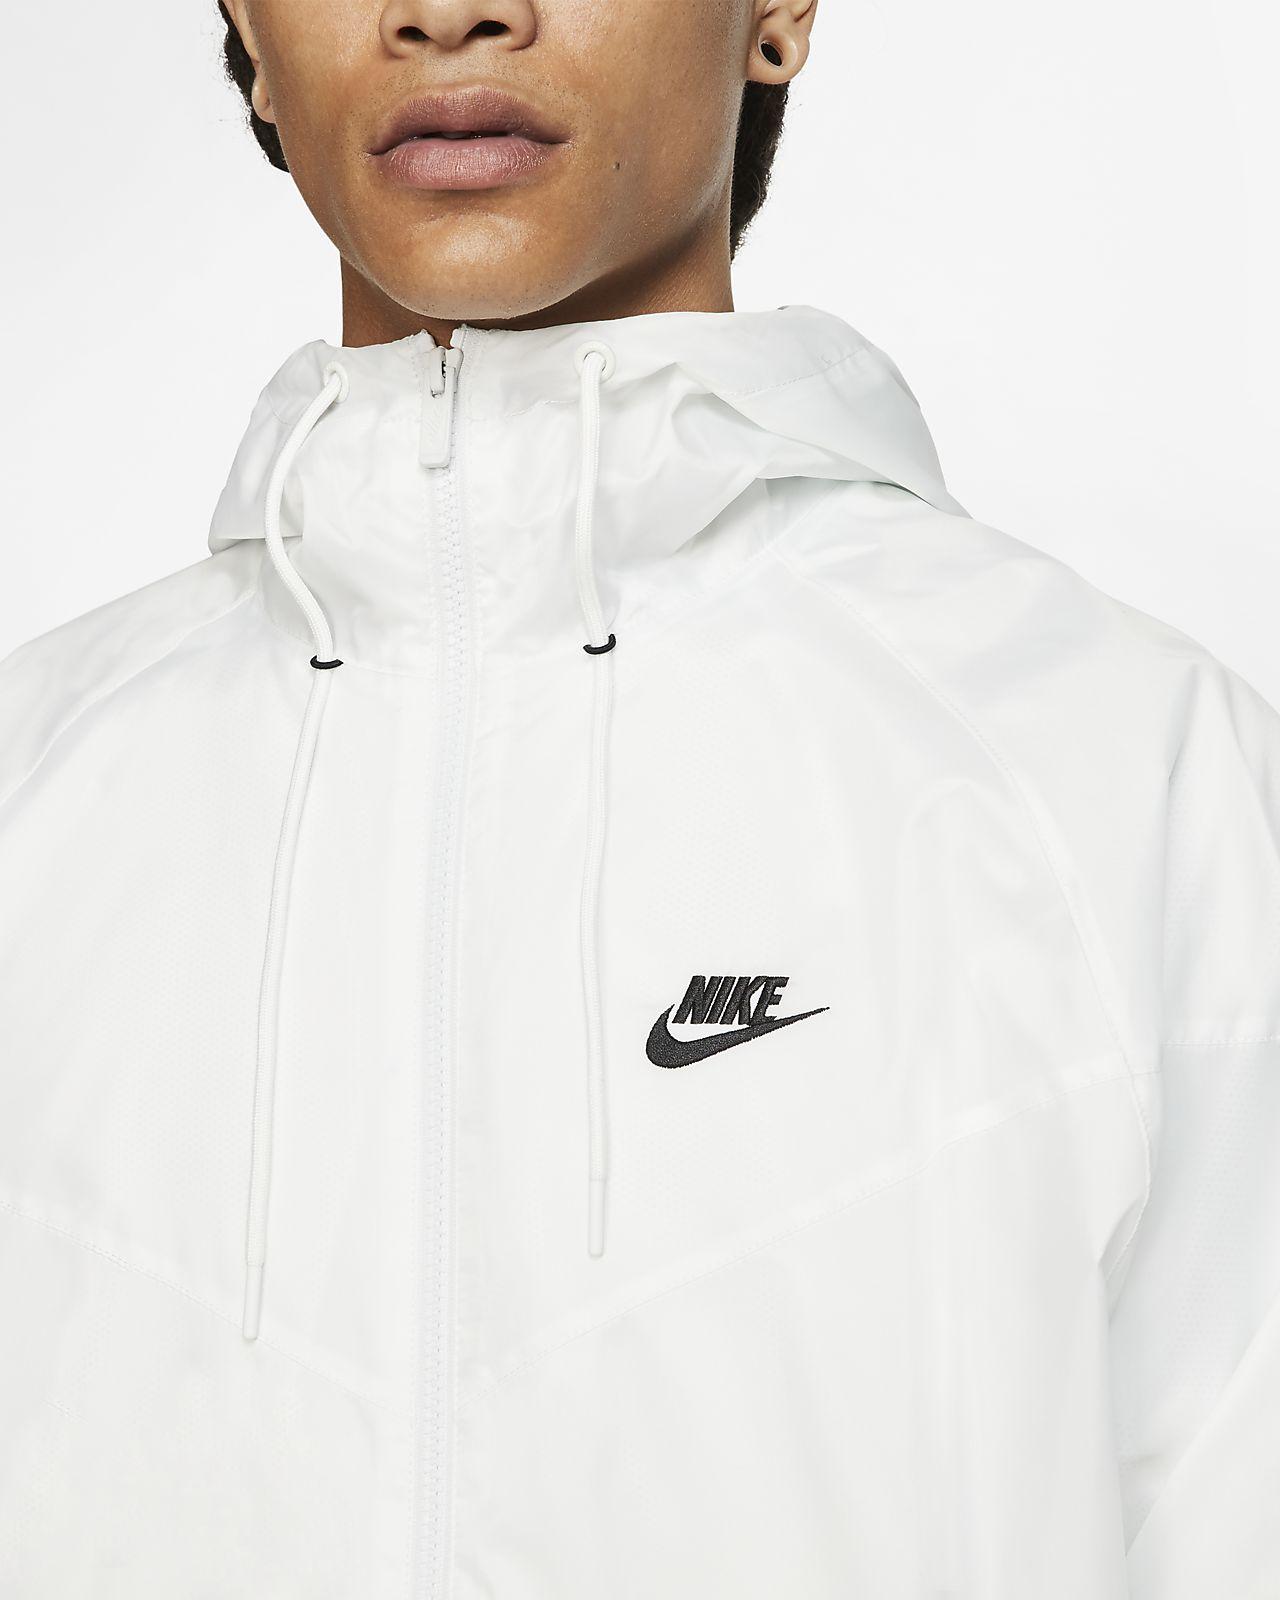 venta minorista 1460c 7cfe4 Nike Sportswear Windrunner Cortavientos con capucha - Hombre